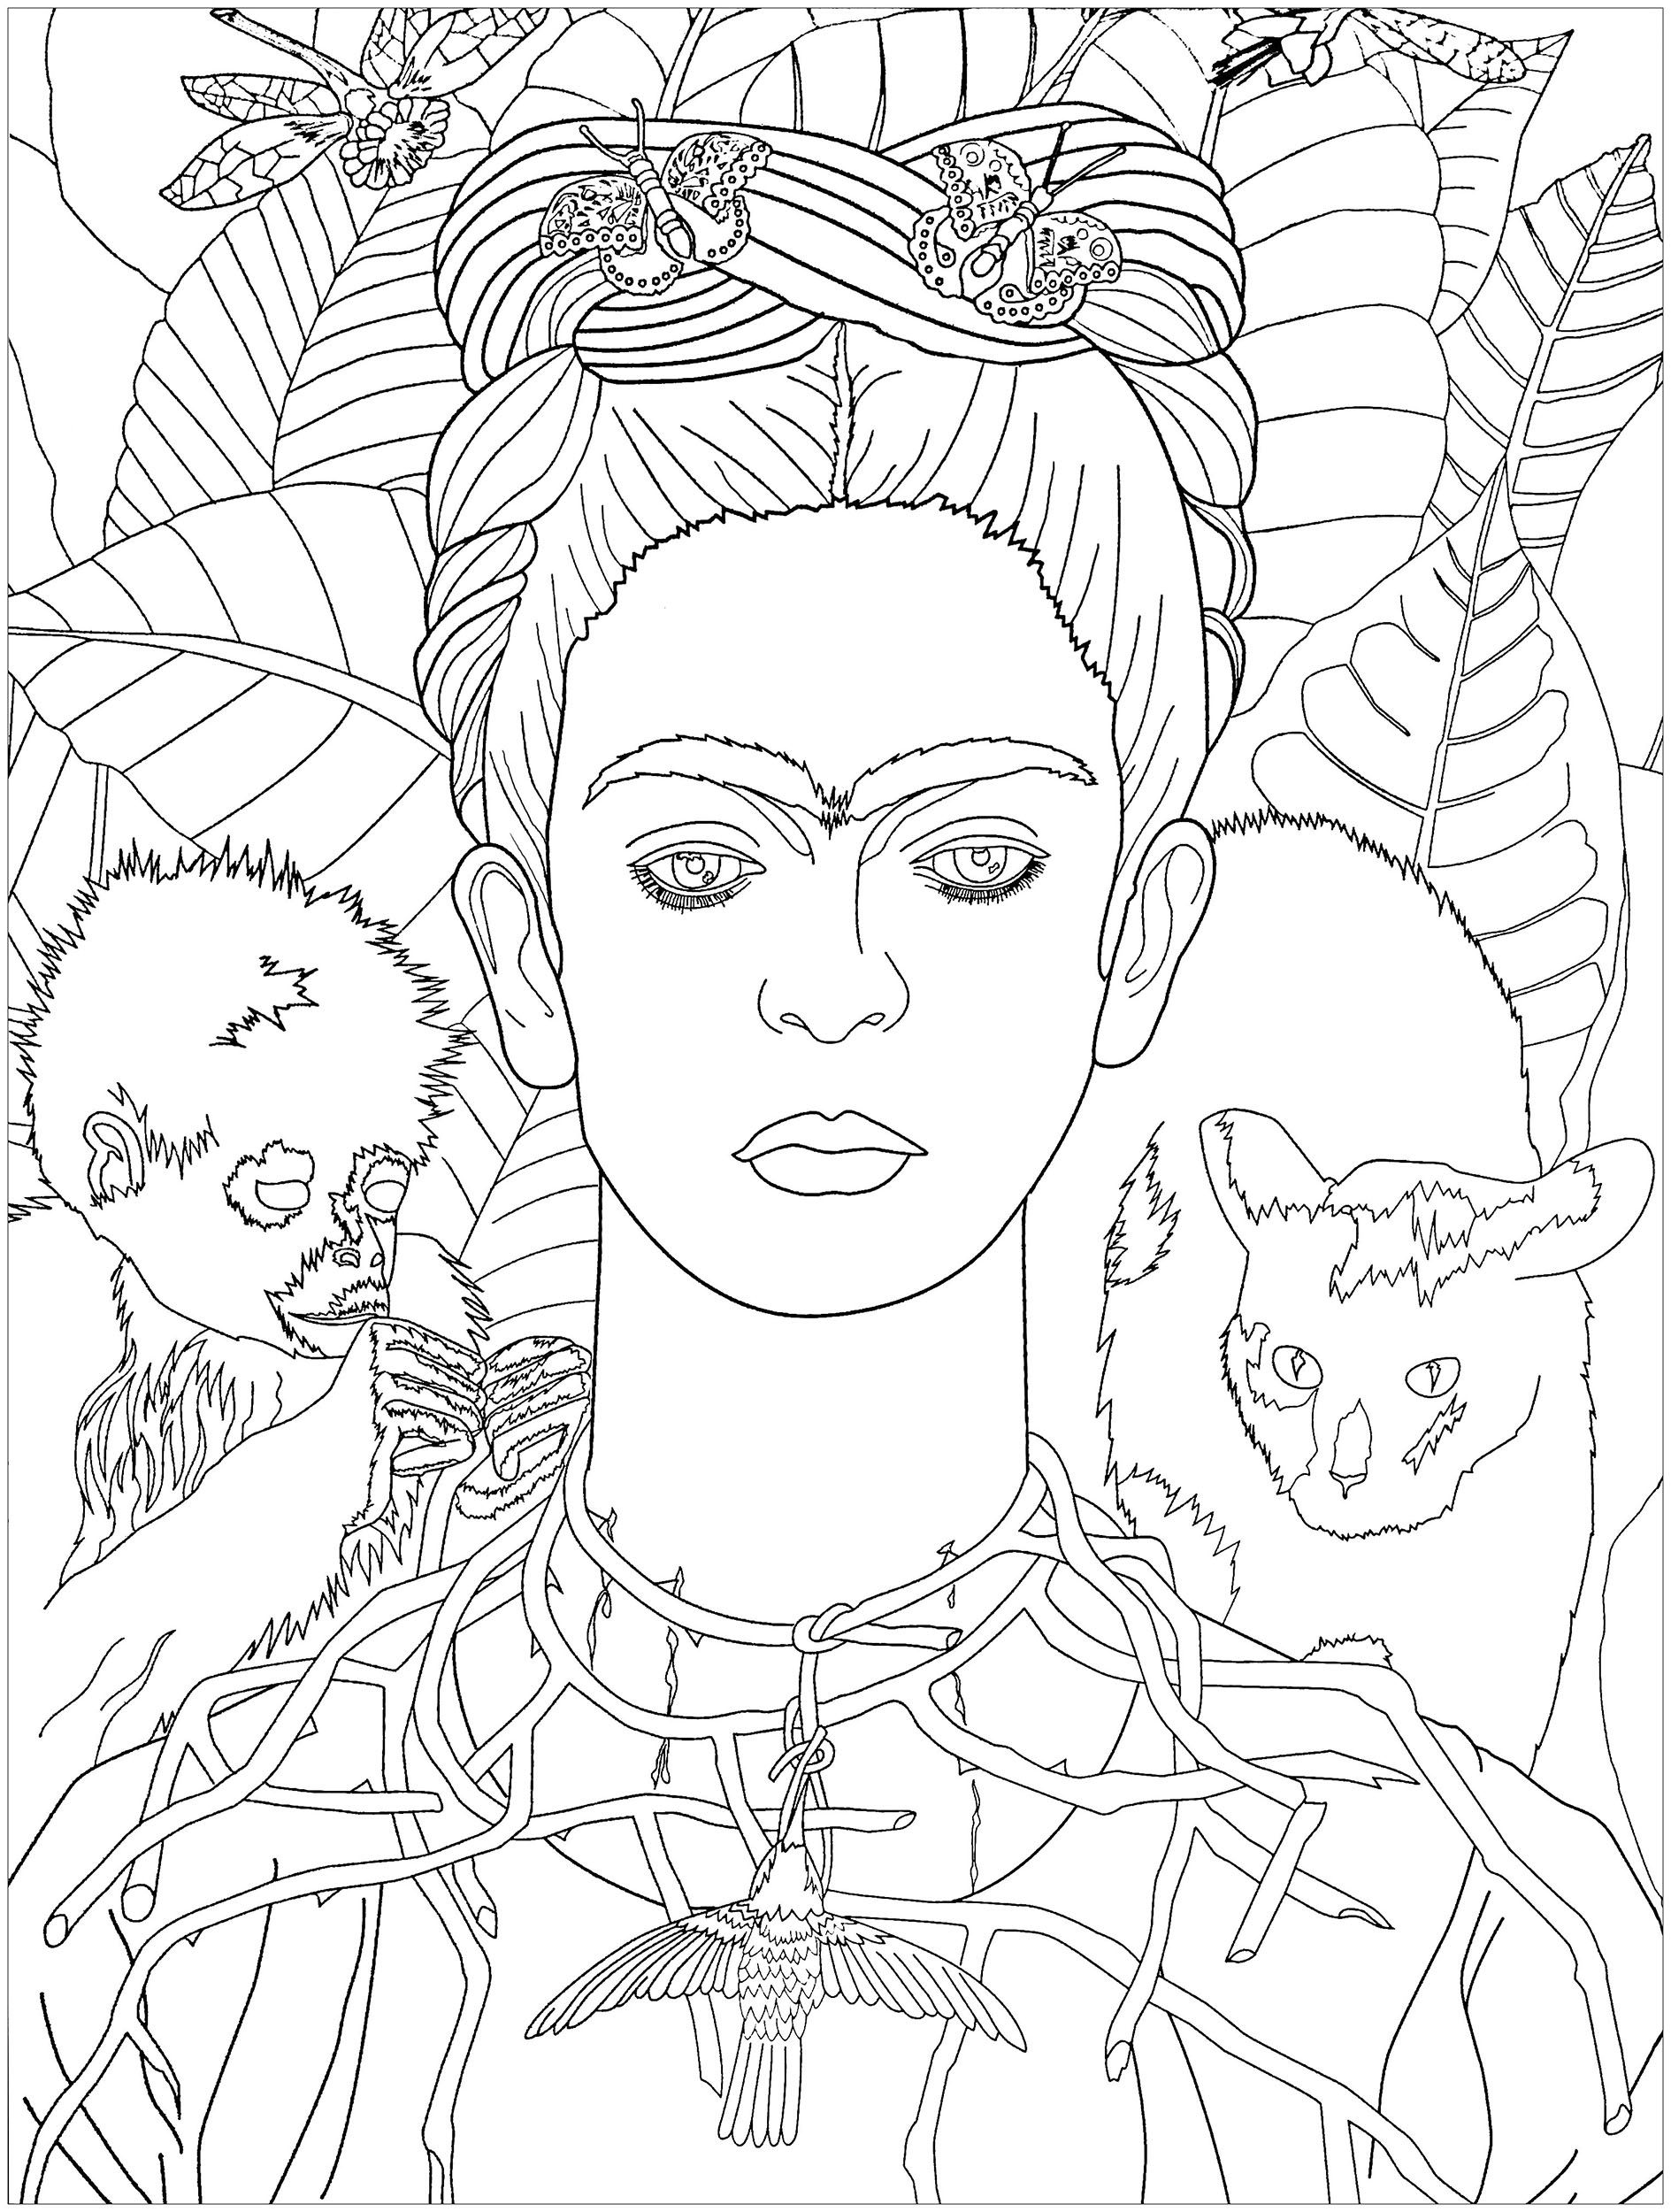 Frida Khalo Self Portrait